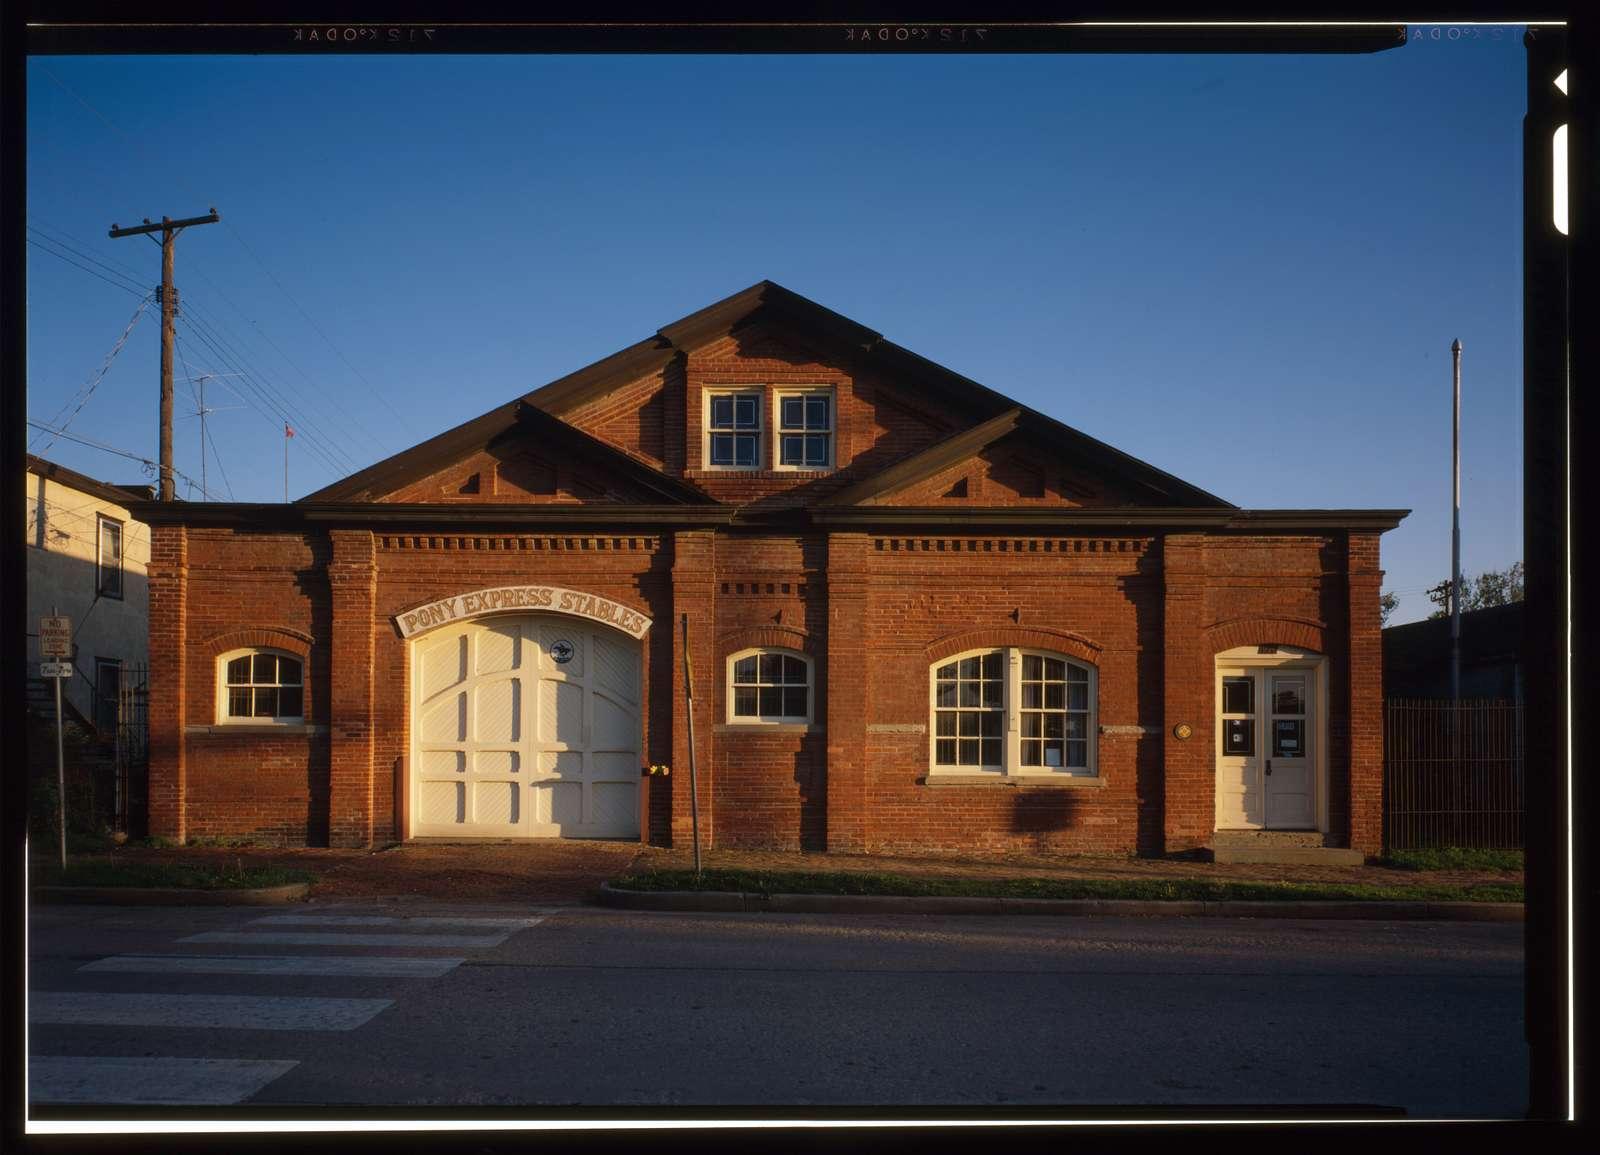 Pony Express Stables, 914 Penn Street, Saint Joseph, Buchanan County, MO